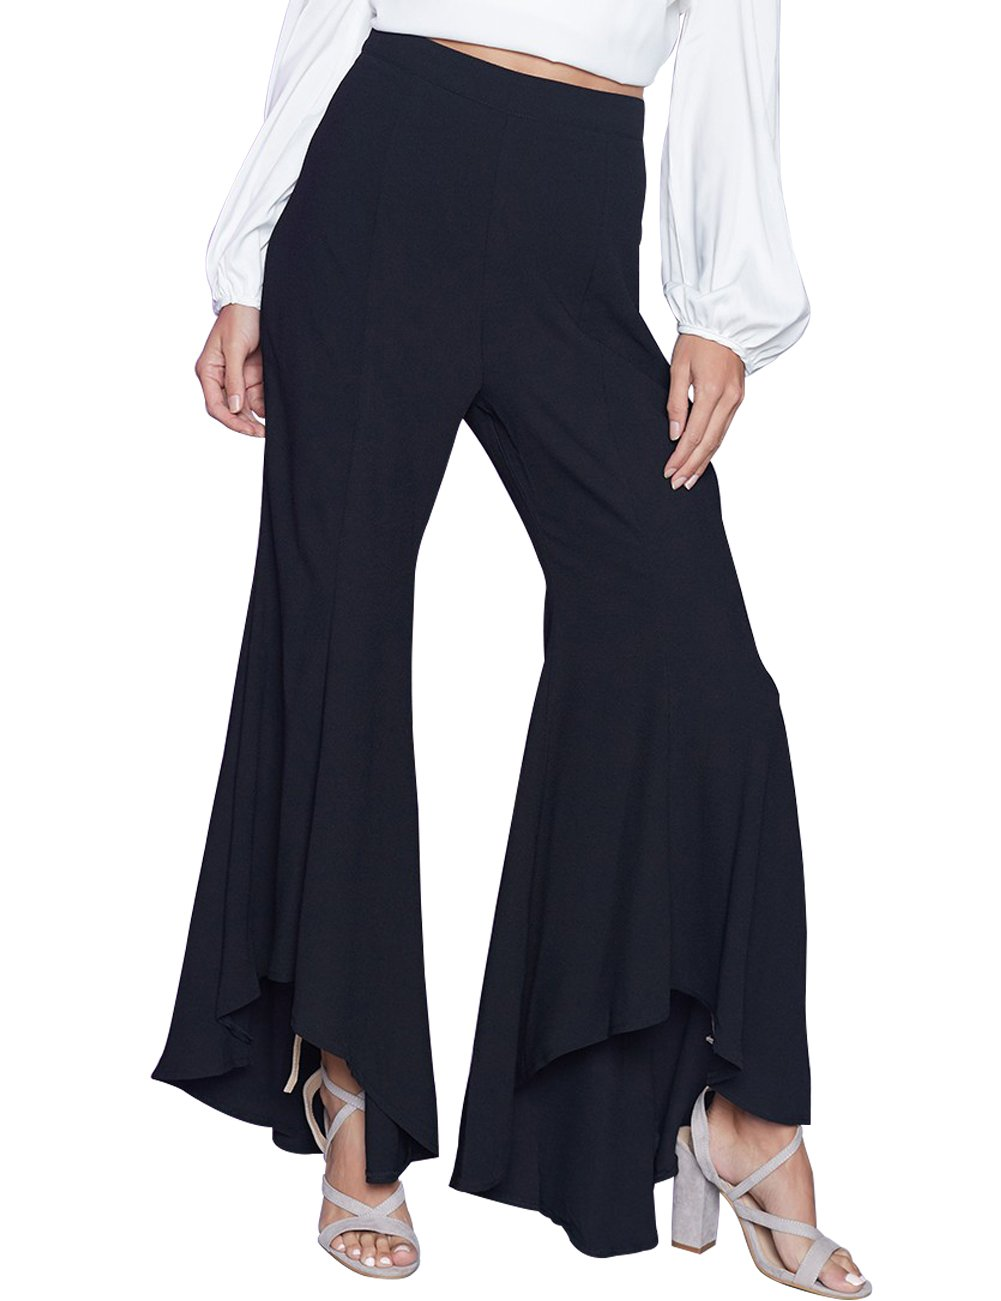 Just Quella Women's Split Hem Wide Leg Long Palazzo Pants 8498 (M, Black 2)